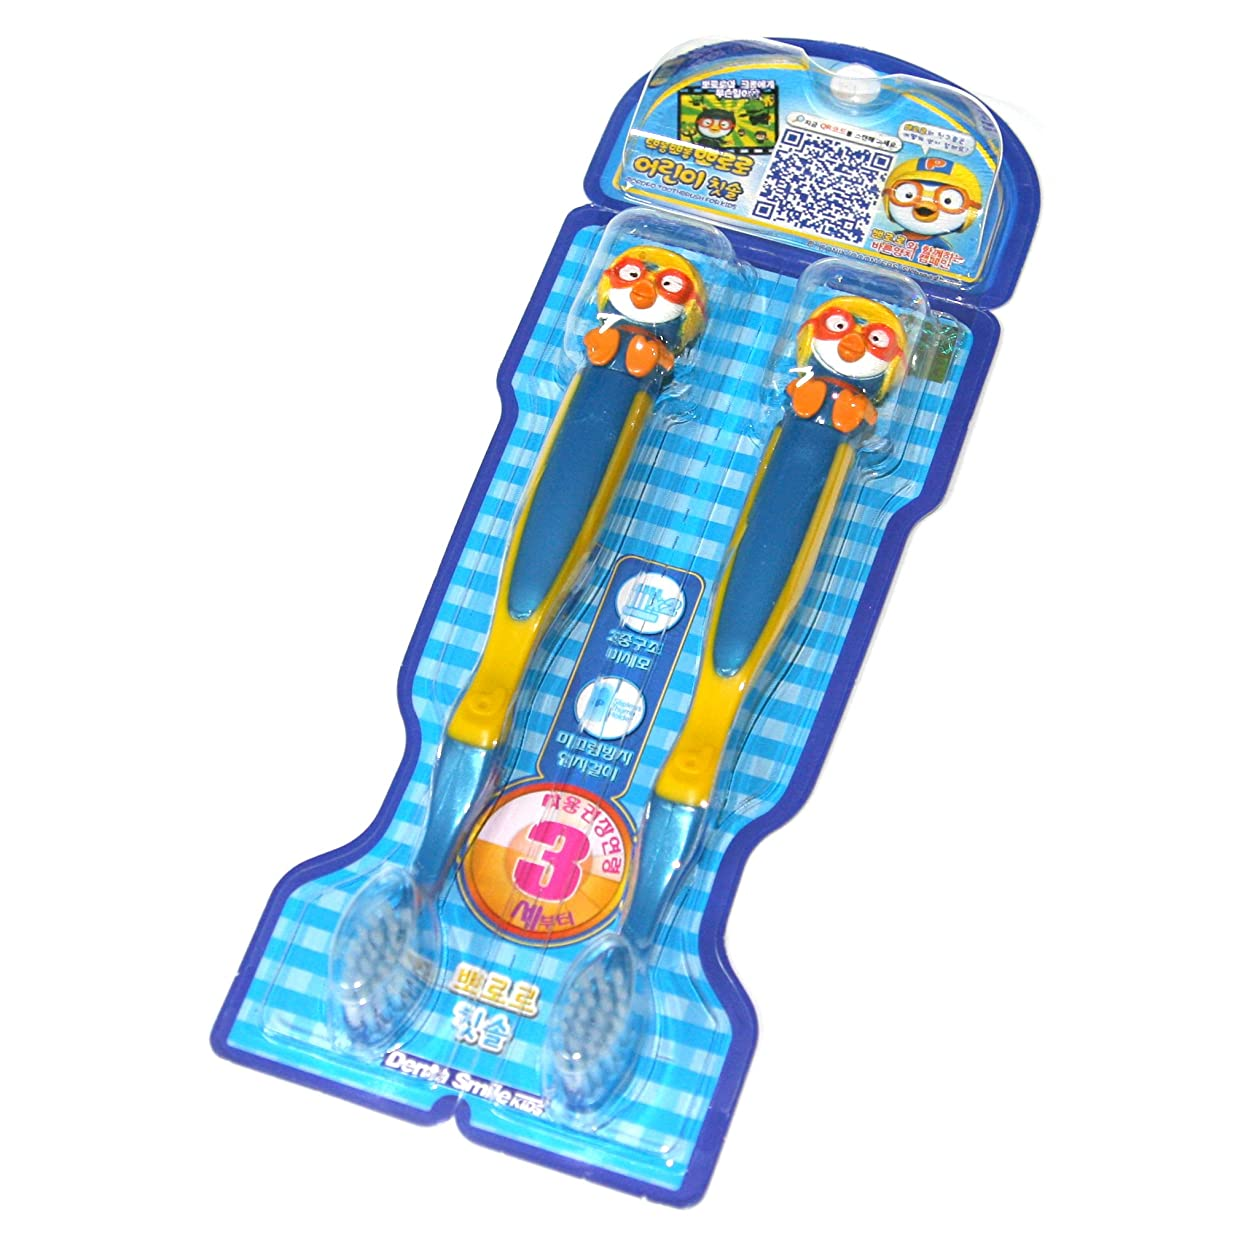 PORORO Toothbrush For Kids 2ea set (PORORO) ポロロ 子供用 歯ブラシ2ea set (ポロロ ) [並行輸入品]